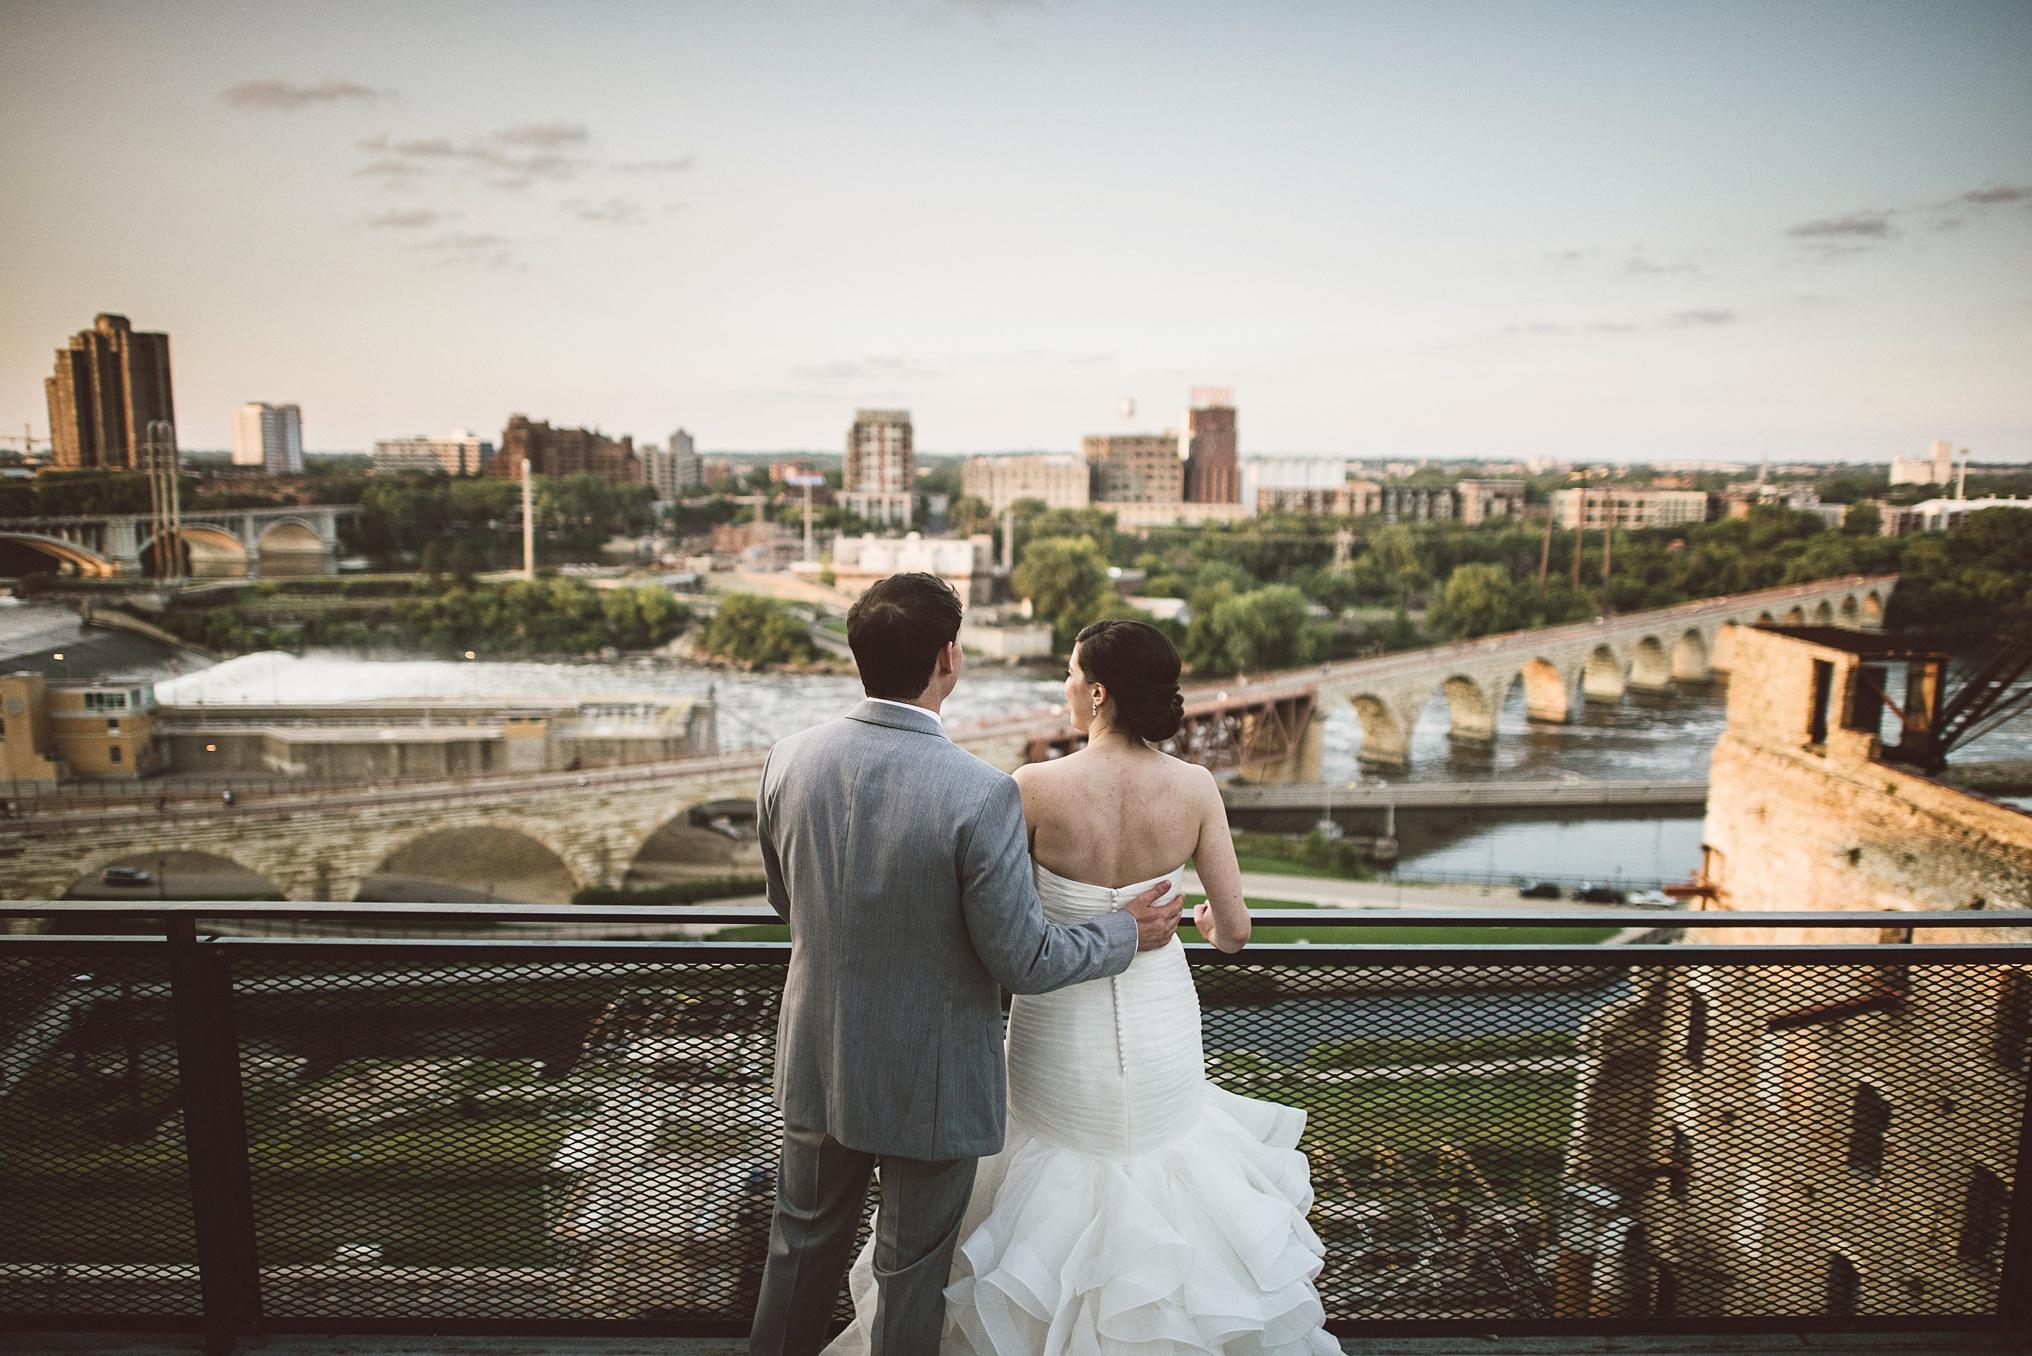 best_wedding_photography_2017_by_lucas_botz_photography_118.jpg